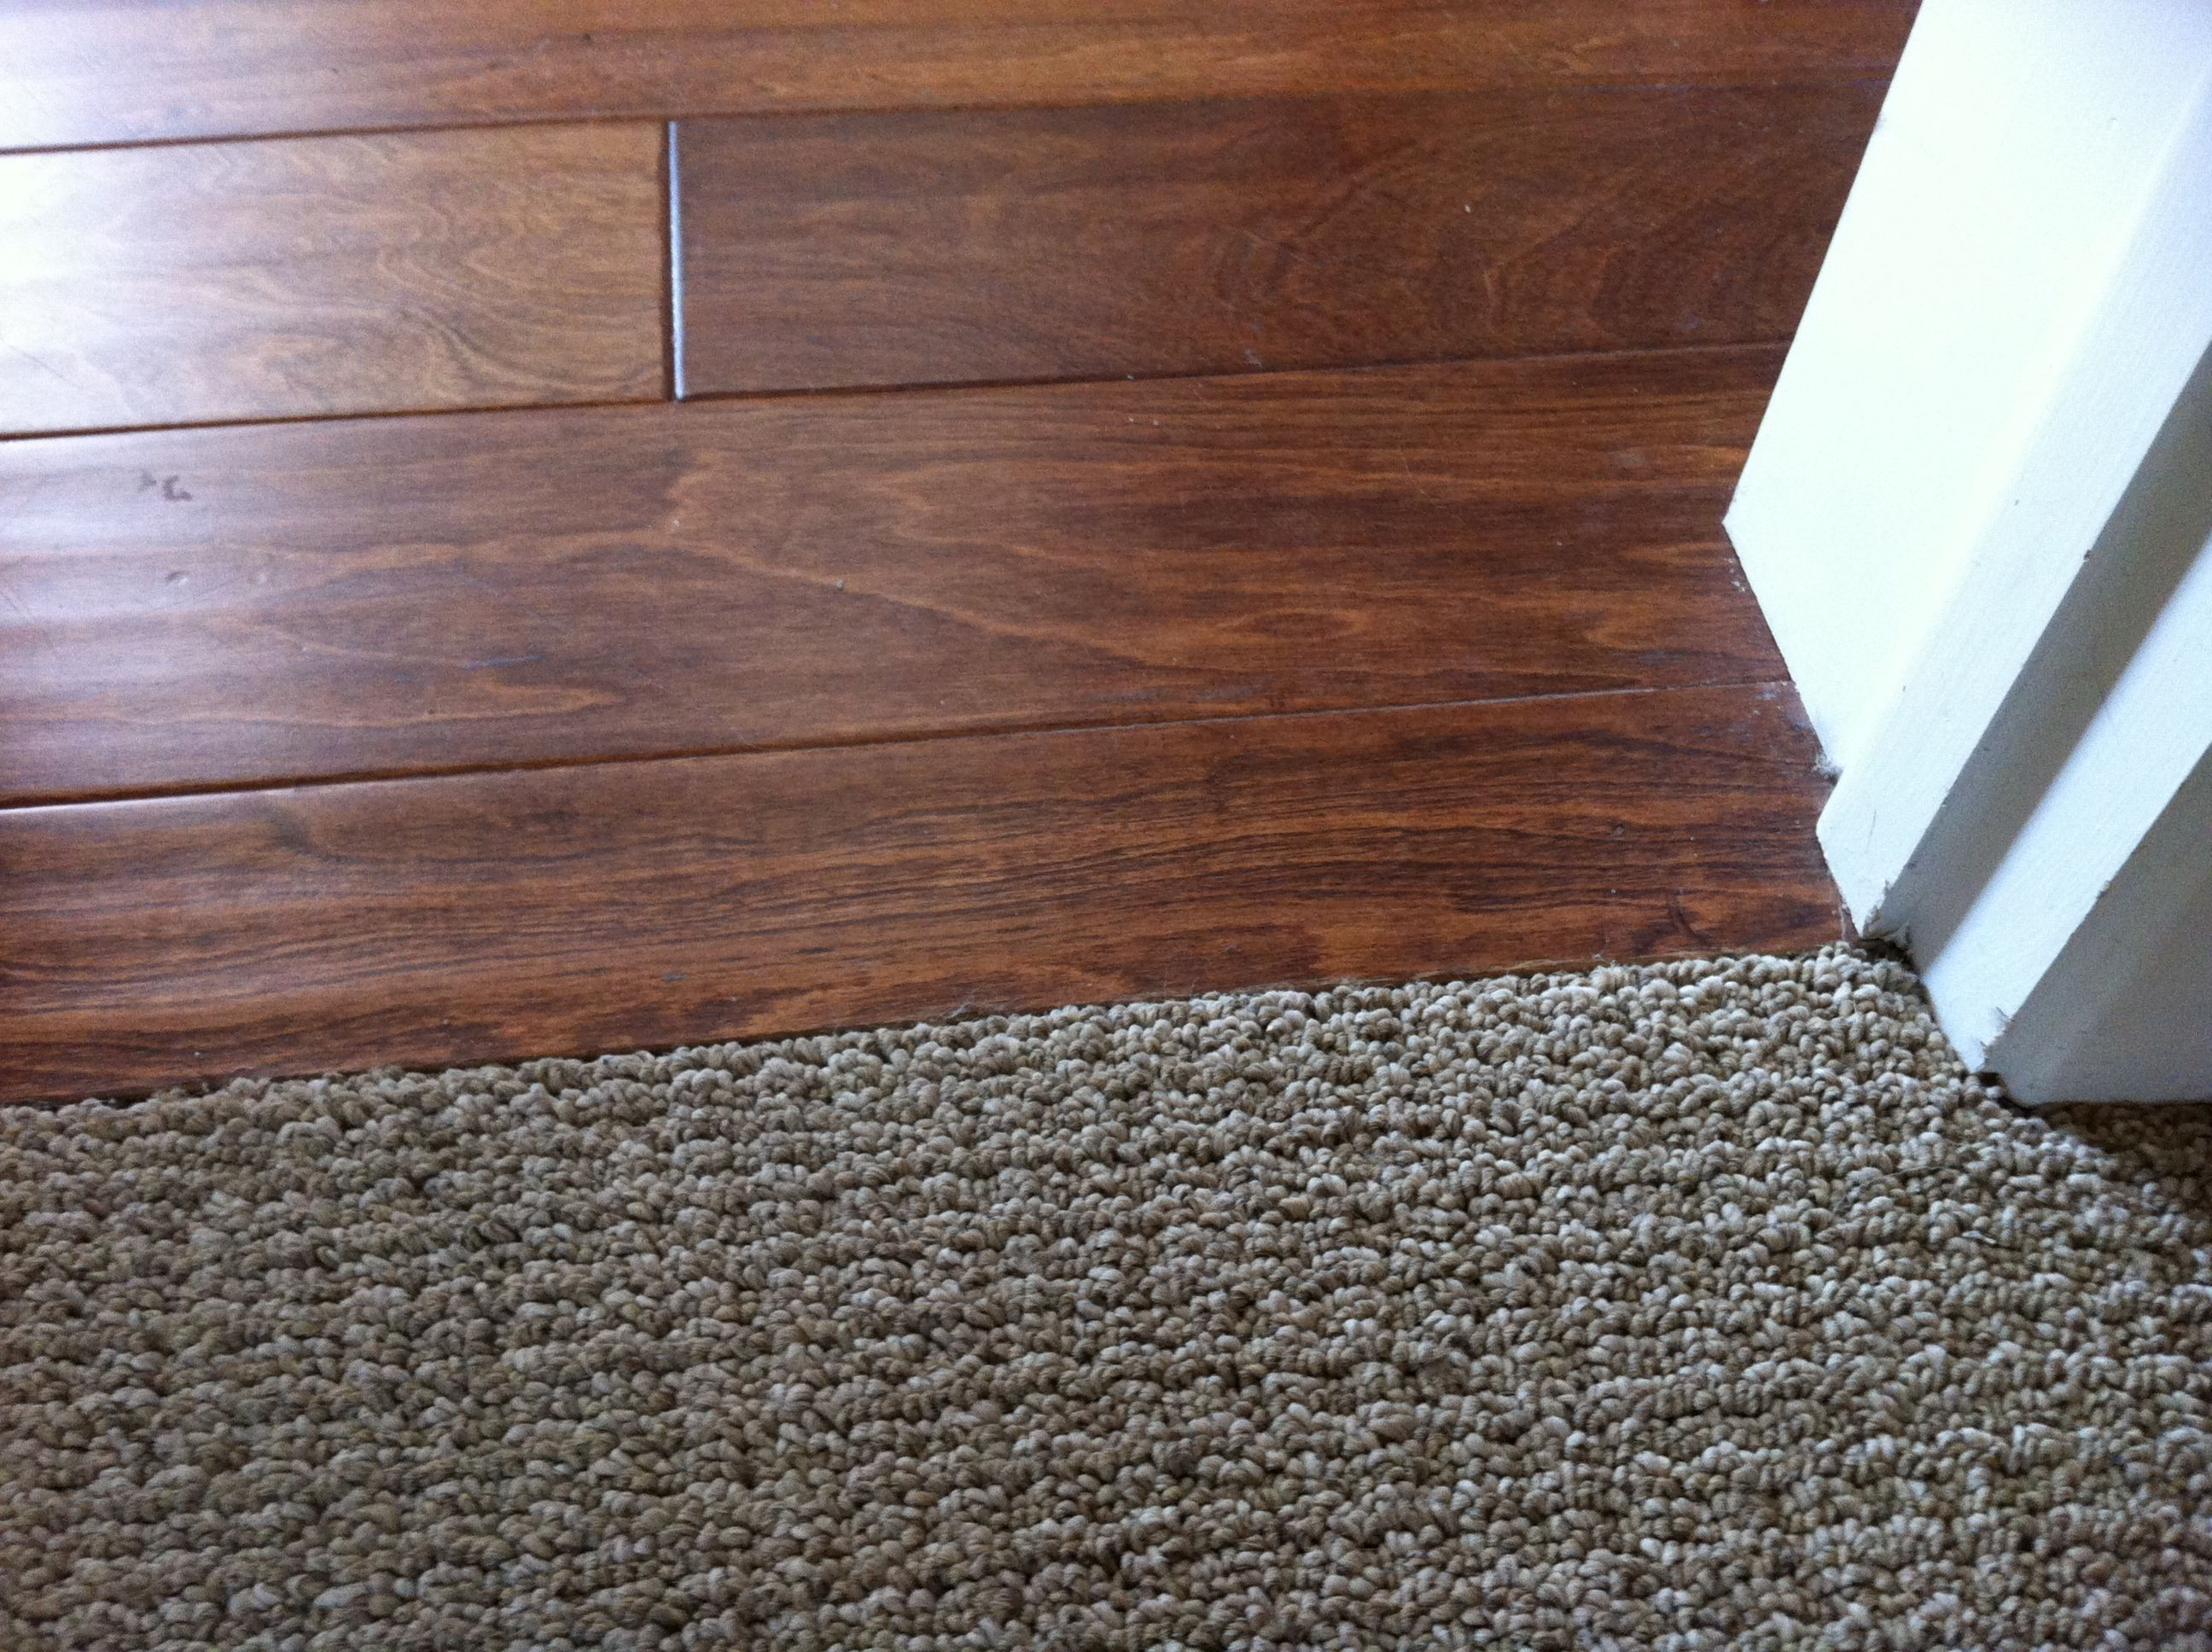 Laminate Flooring To Carpet Transition On Concrete Flooring